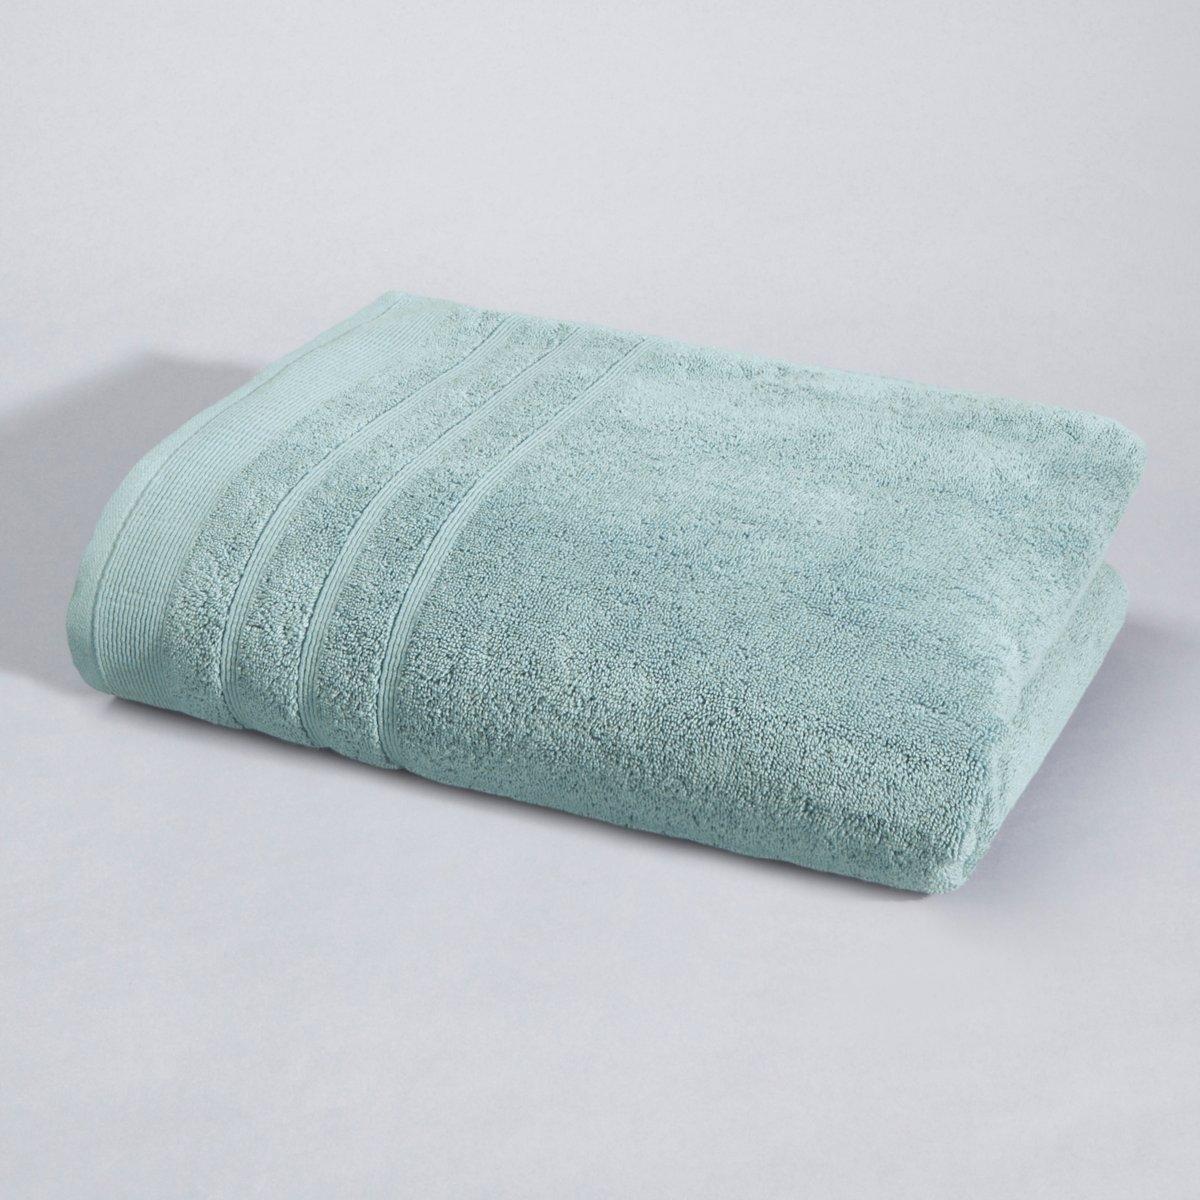 Полотенце банное 600 г/м², Качество Best